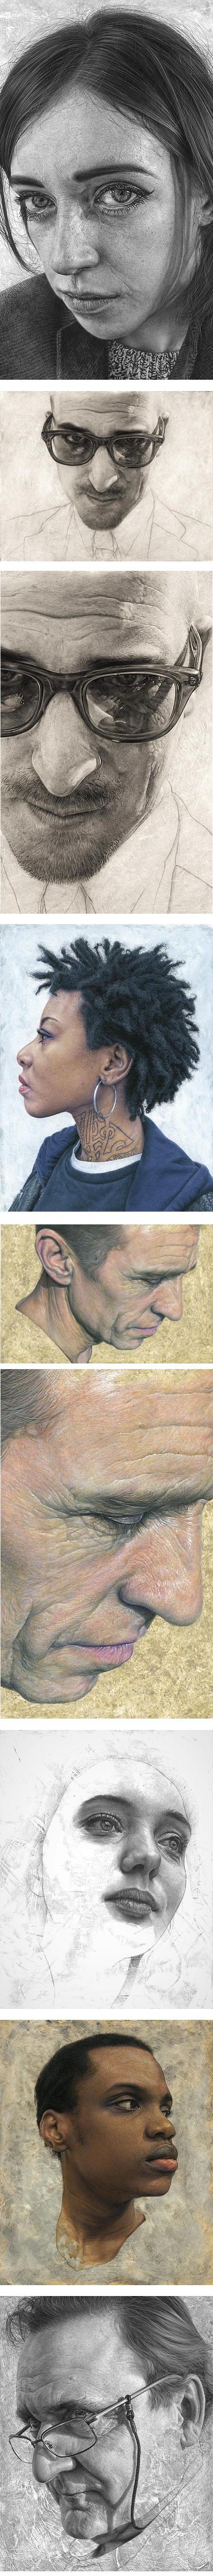 Steve Caldwell, portrait paintings